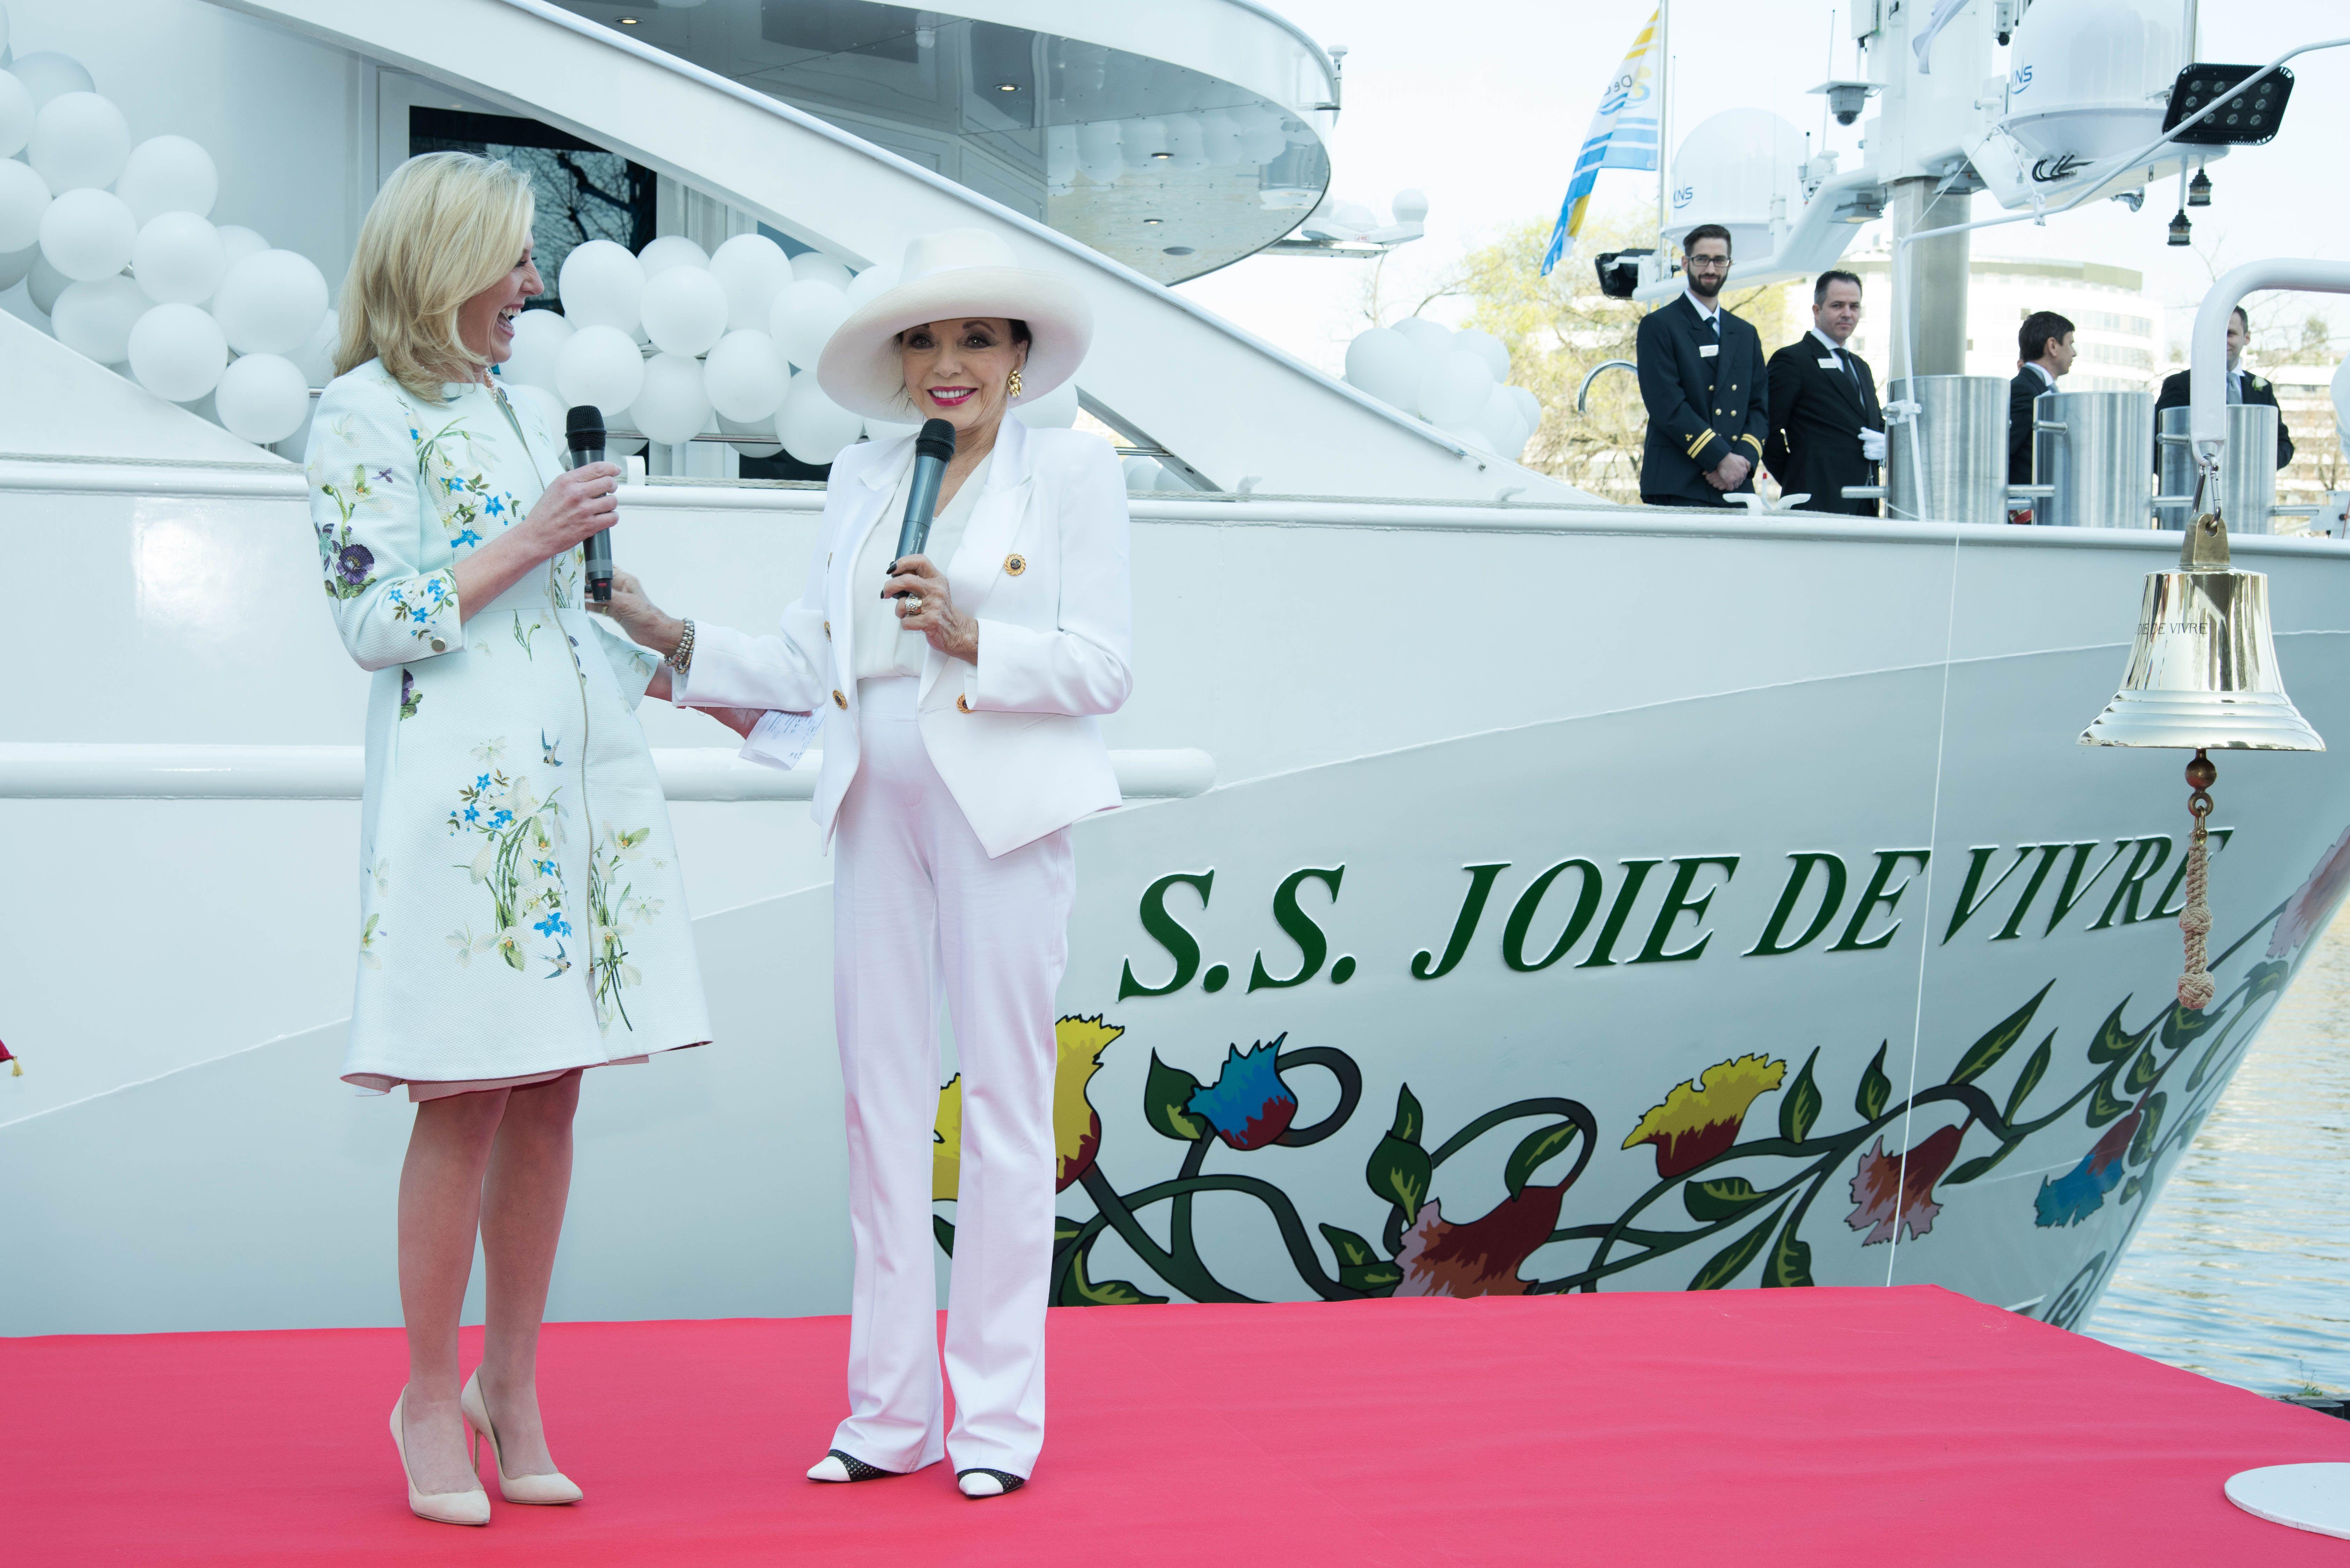 Dame Joan Collins Christening the Joie De Vivre